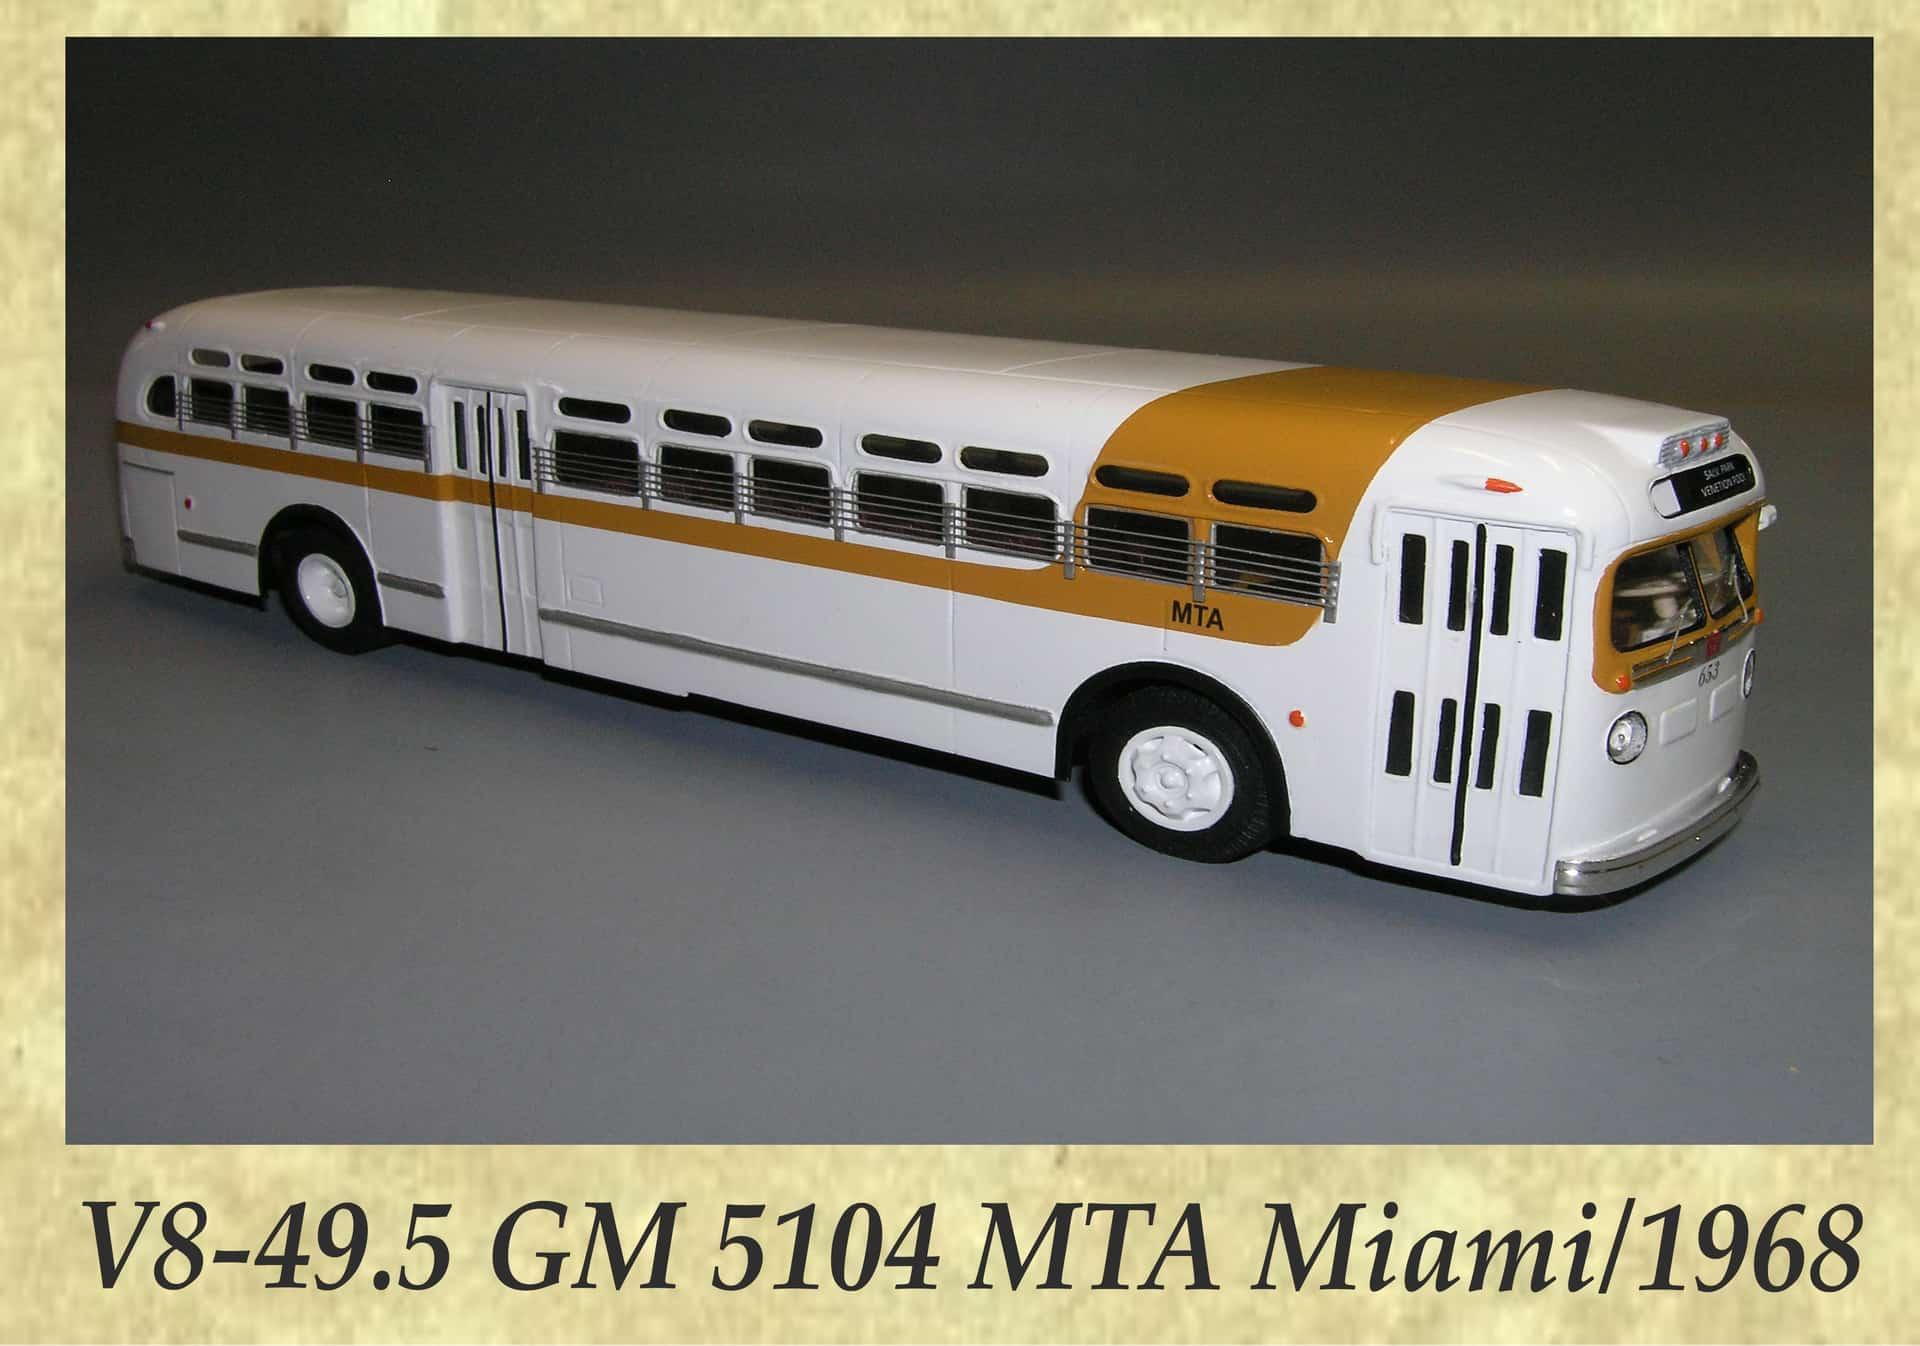 V8-49.5 GM 5104 MTA Miami 1968